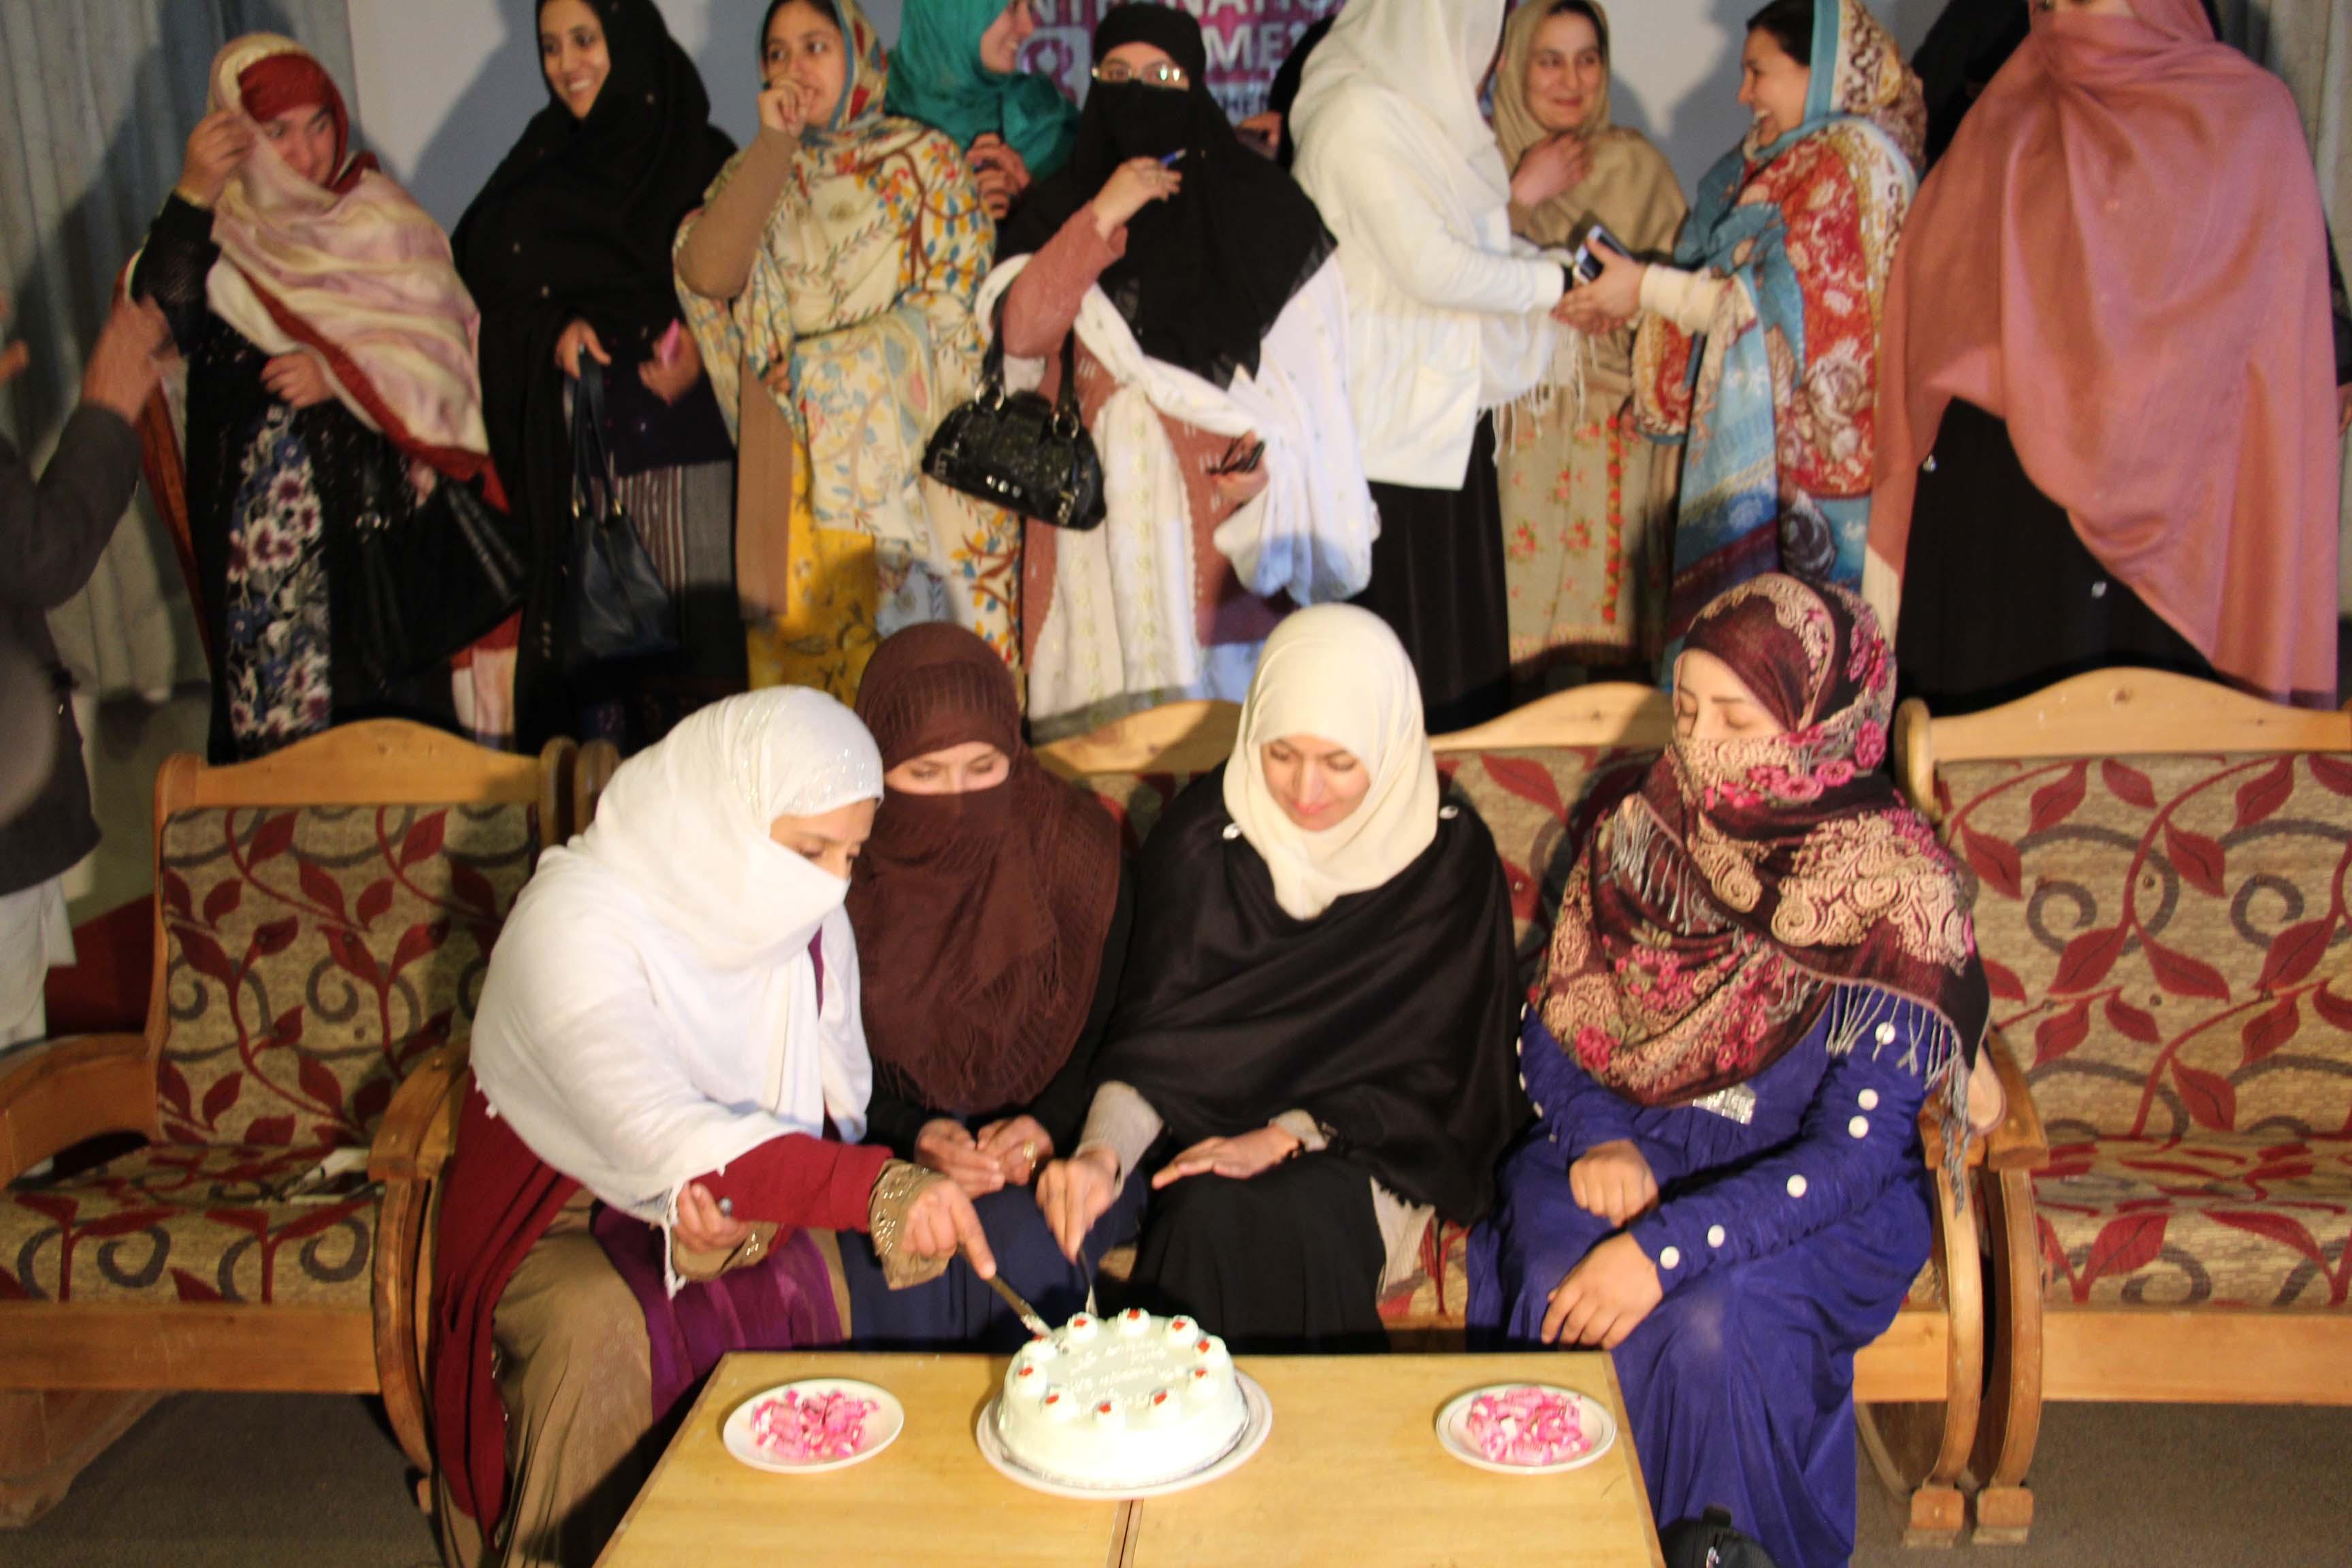 Chitral: Women demand implementation of gender policies, making offices safer